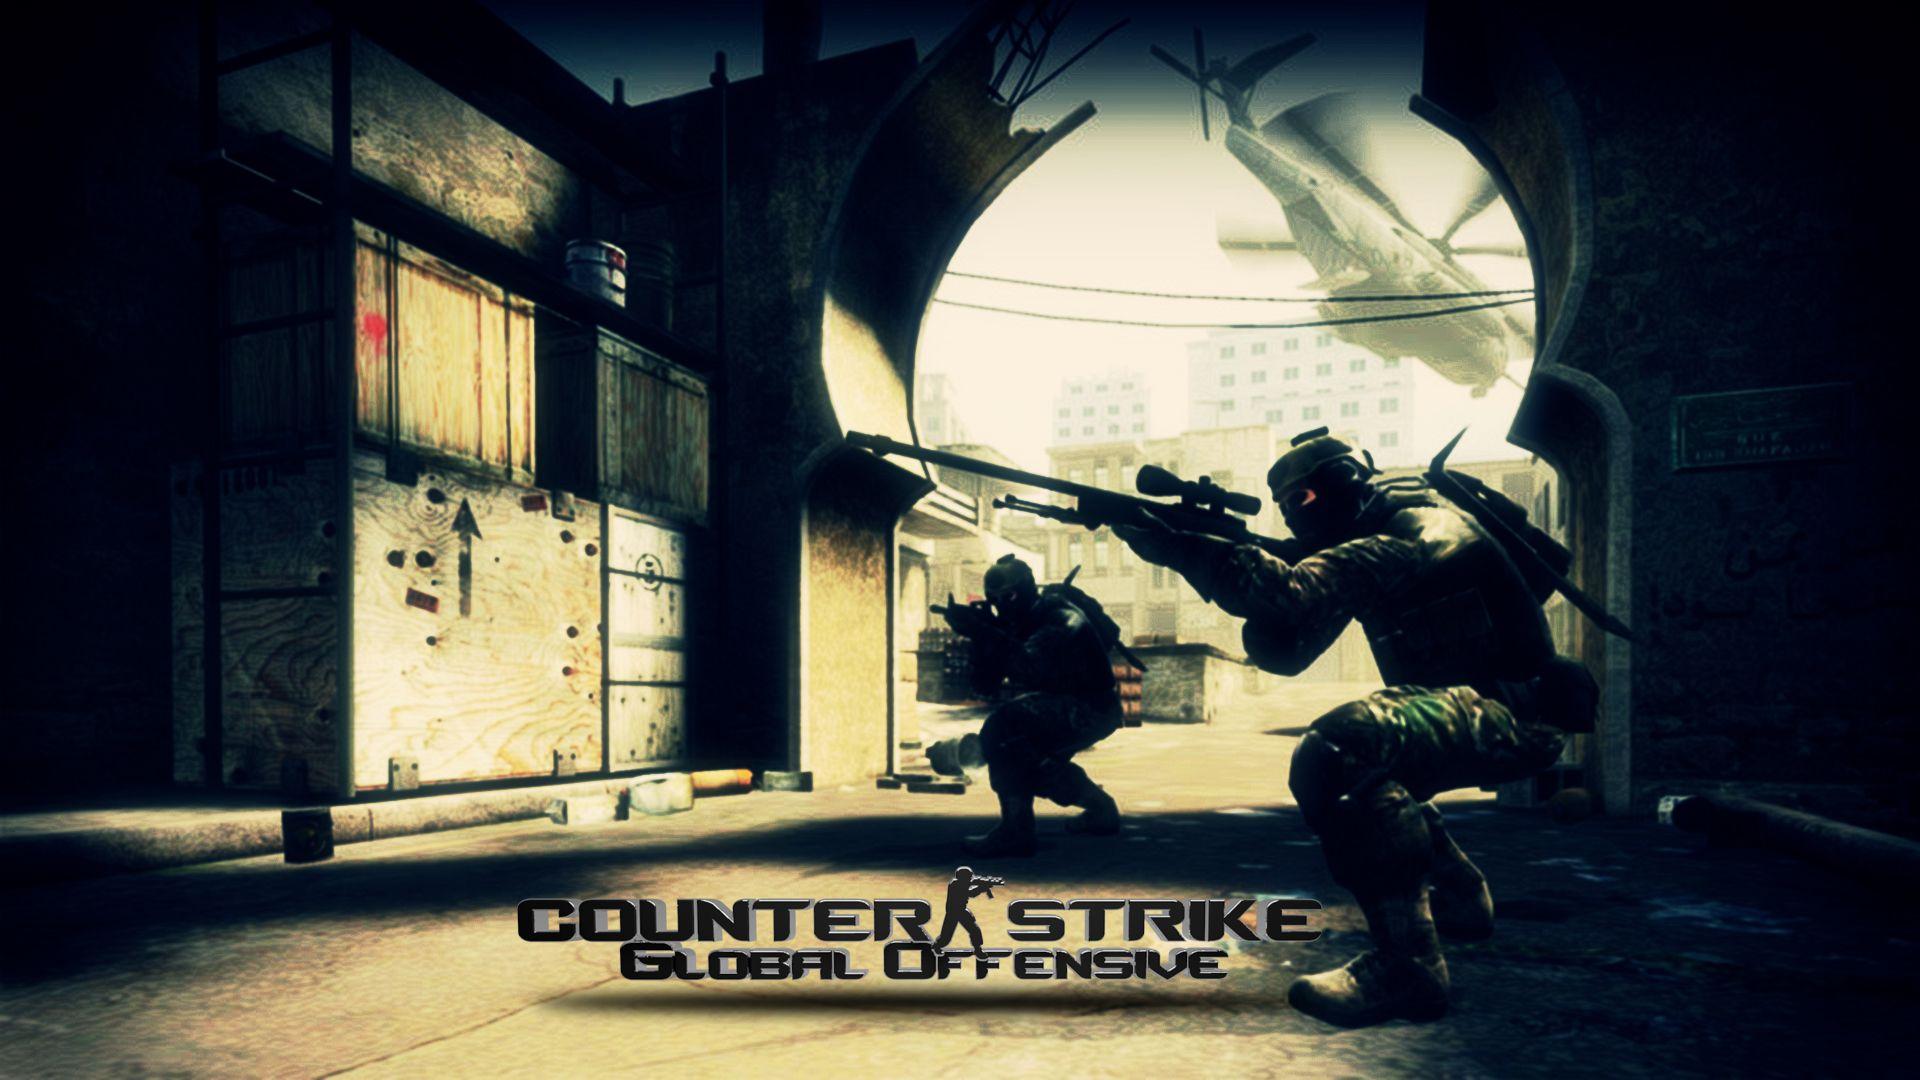 Games Counter Strike Global Offensive desktop wallpaper nr 1920x1080